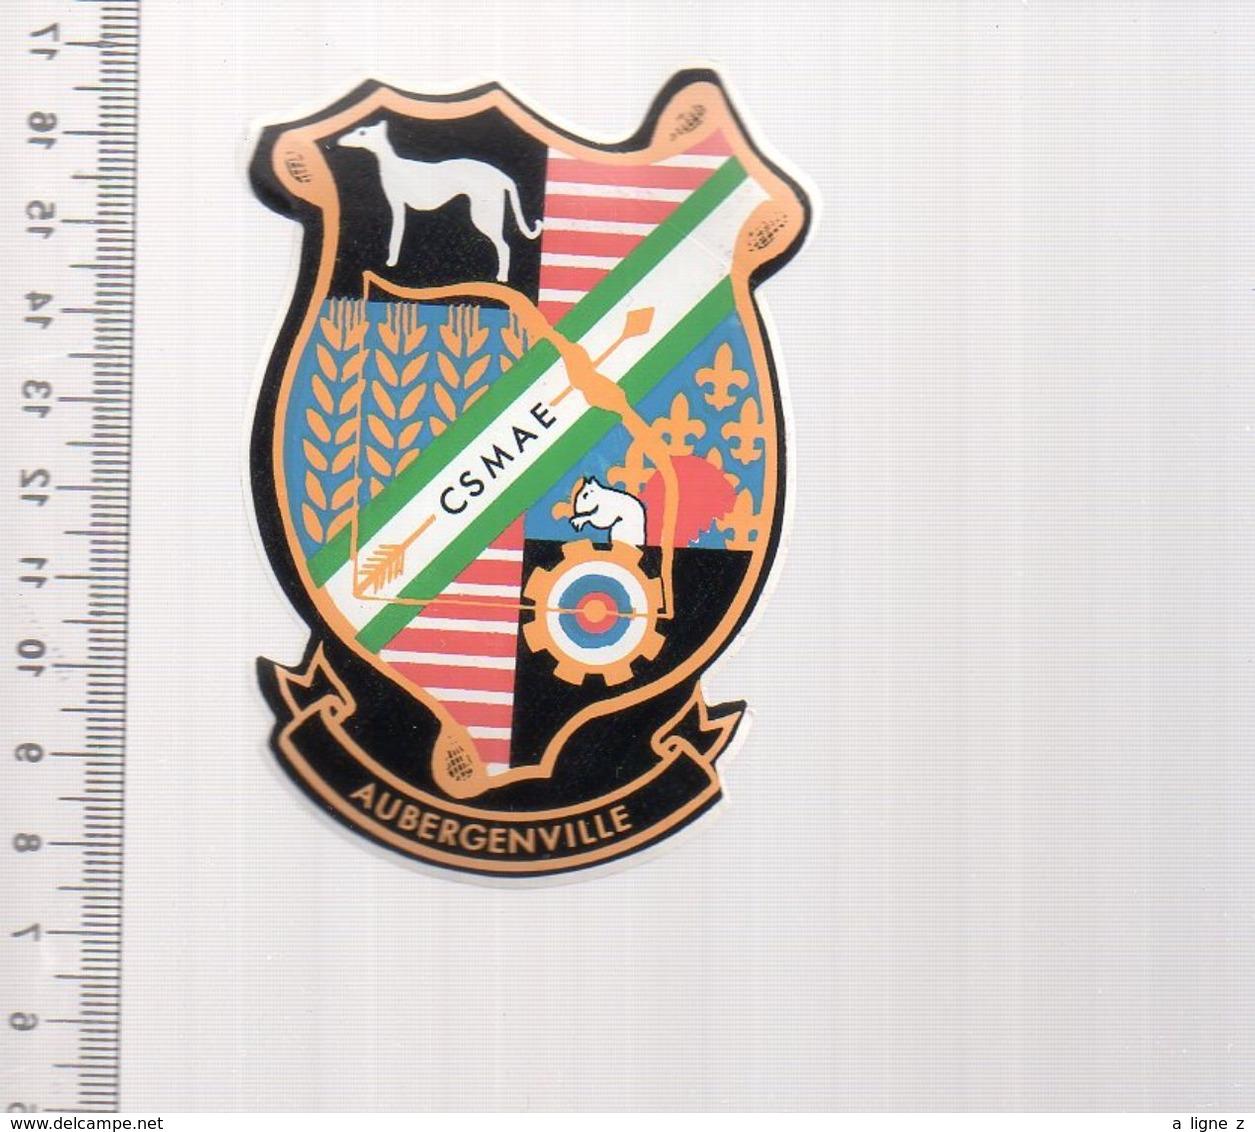 REF 10 : Autocollant Sticker Thème TIR A L'ARC Archerie Archer Compagnie Club Aubergenville - Tiro Con L'Arco